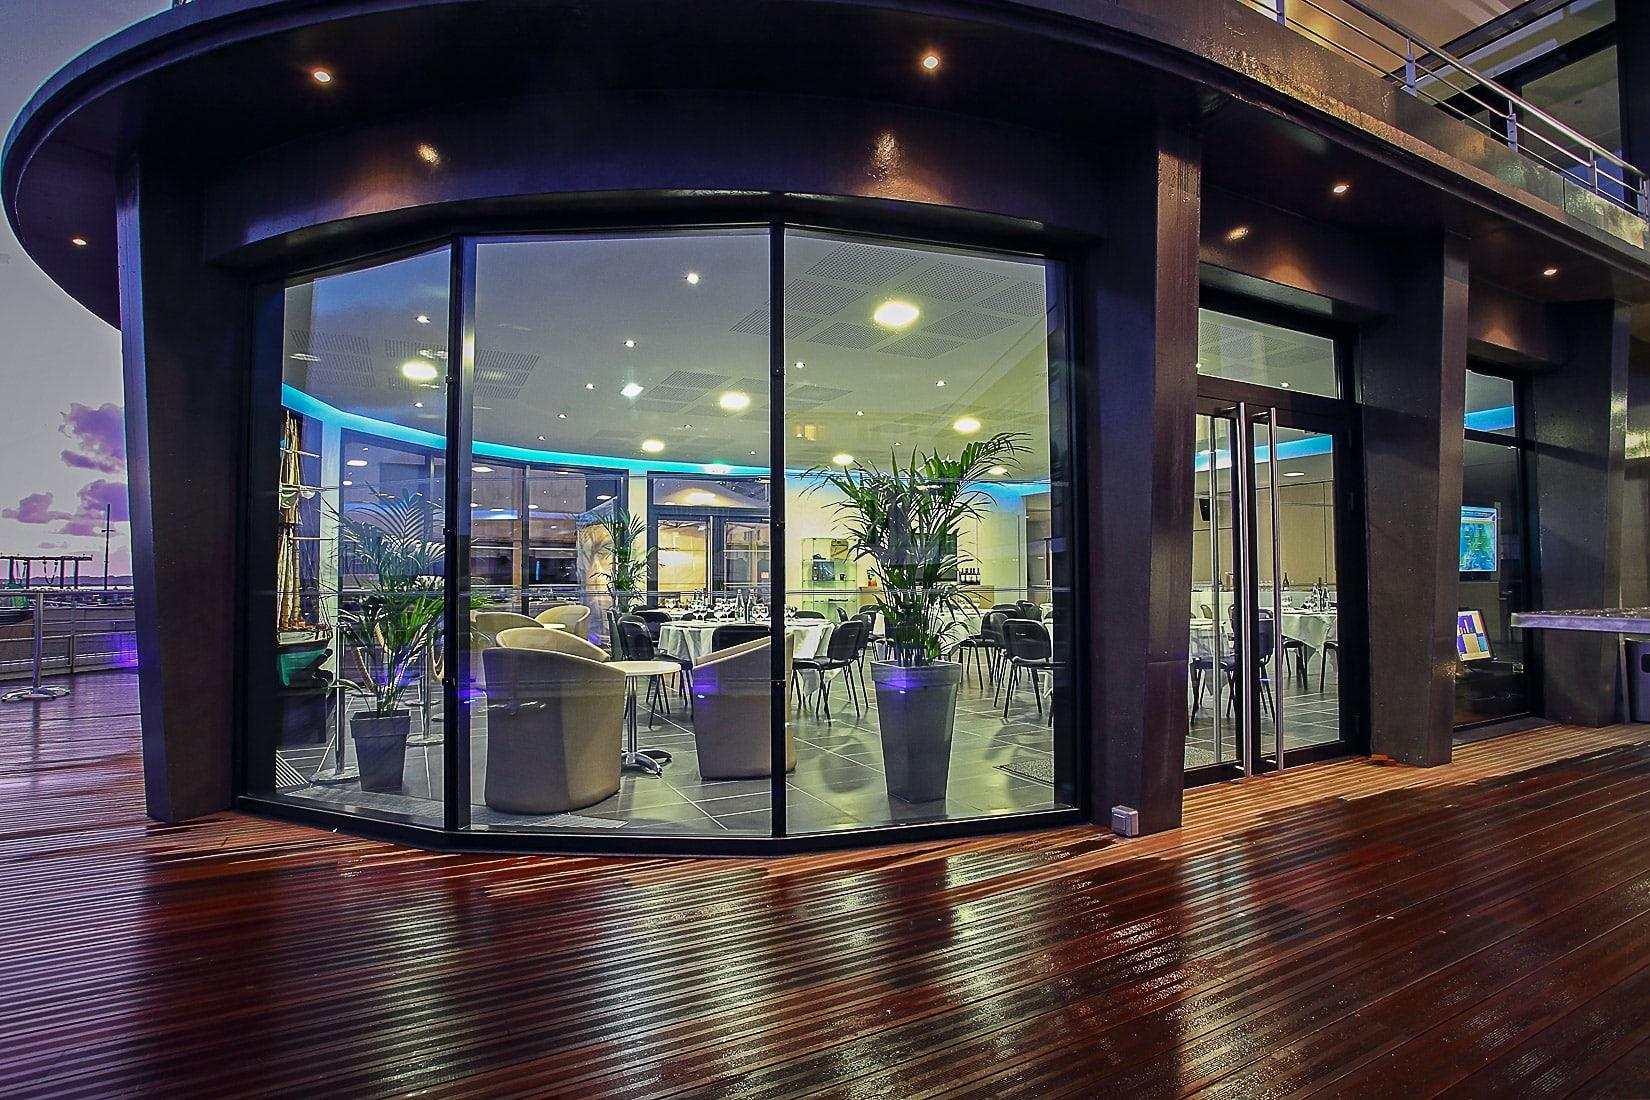 Espace Giraudeau - Club house vue extérieure